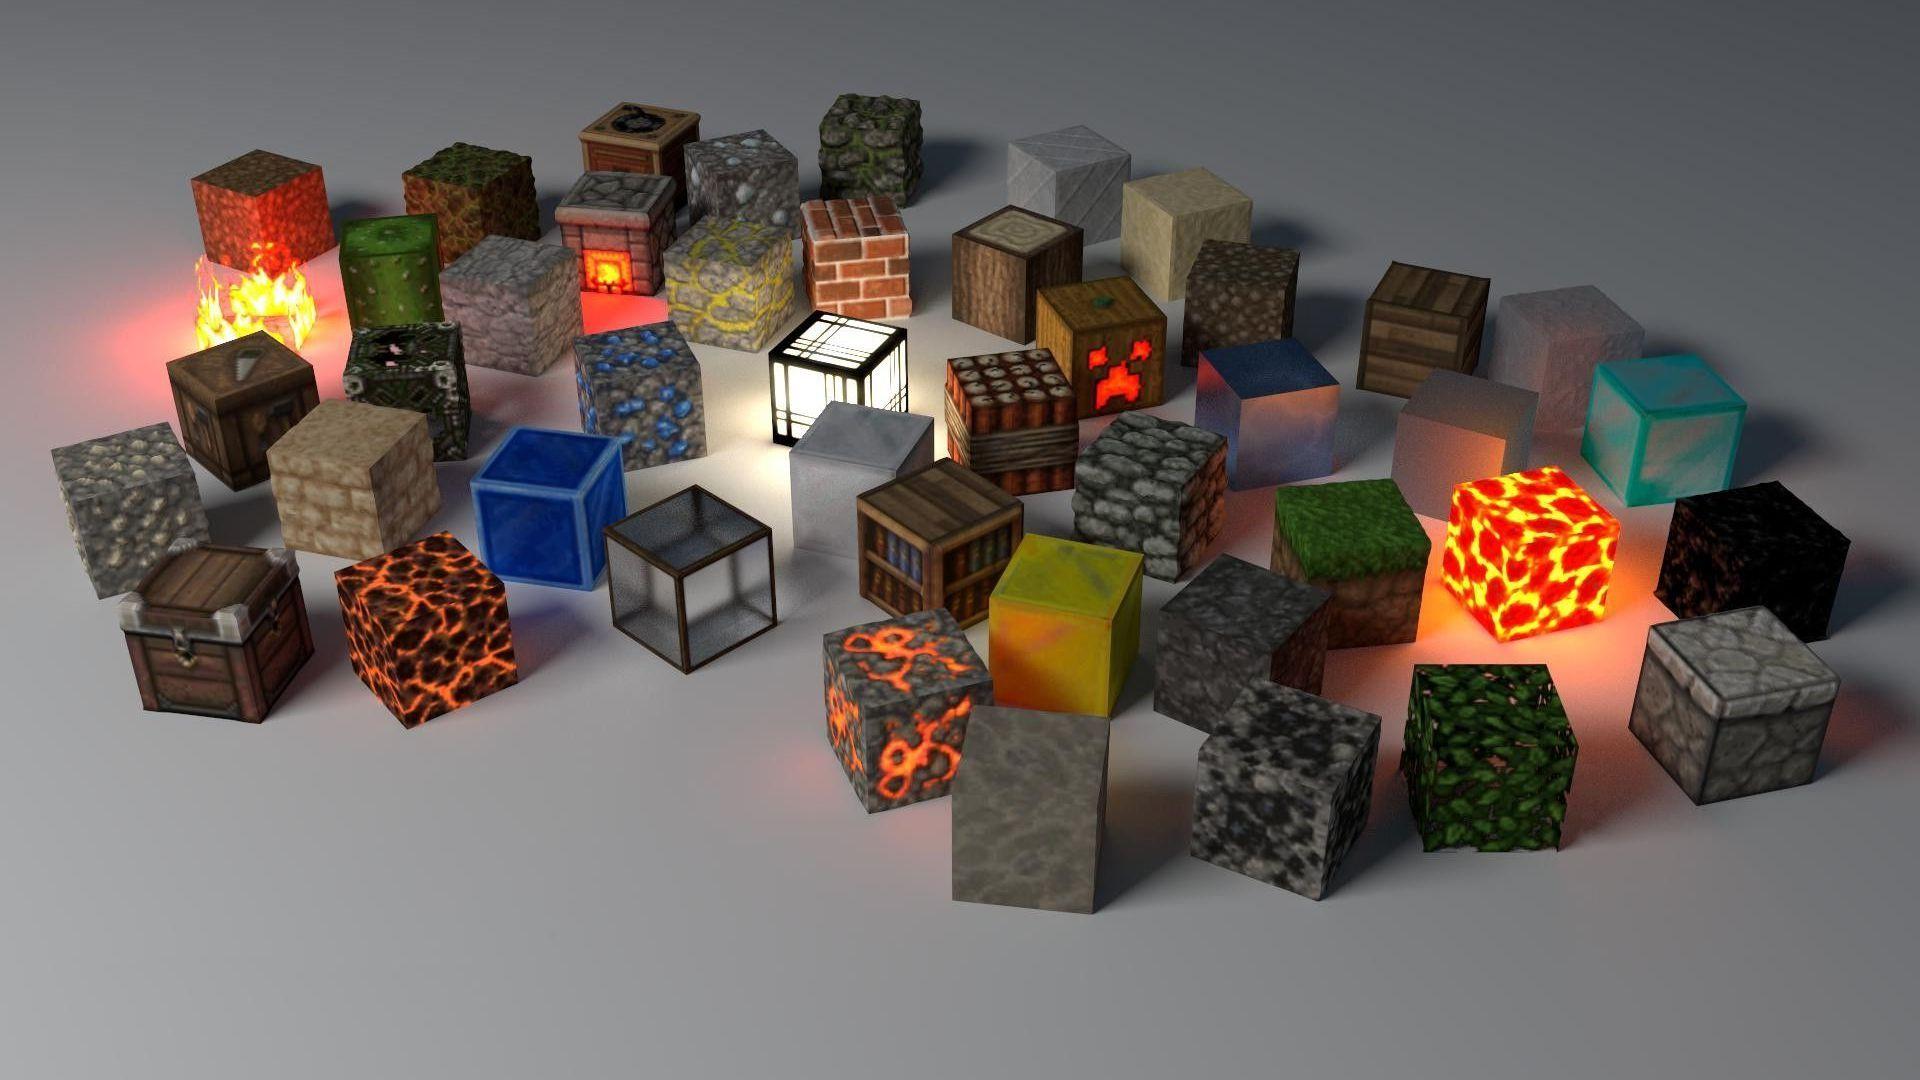 Good Wallpaper Minecraft Chromebook - 5645497339b7e61f232ead2af2116813  Photograph_227367.jpg